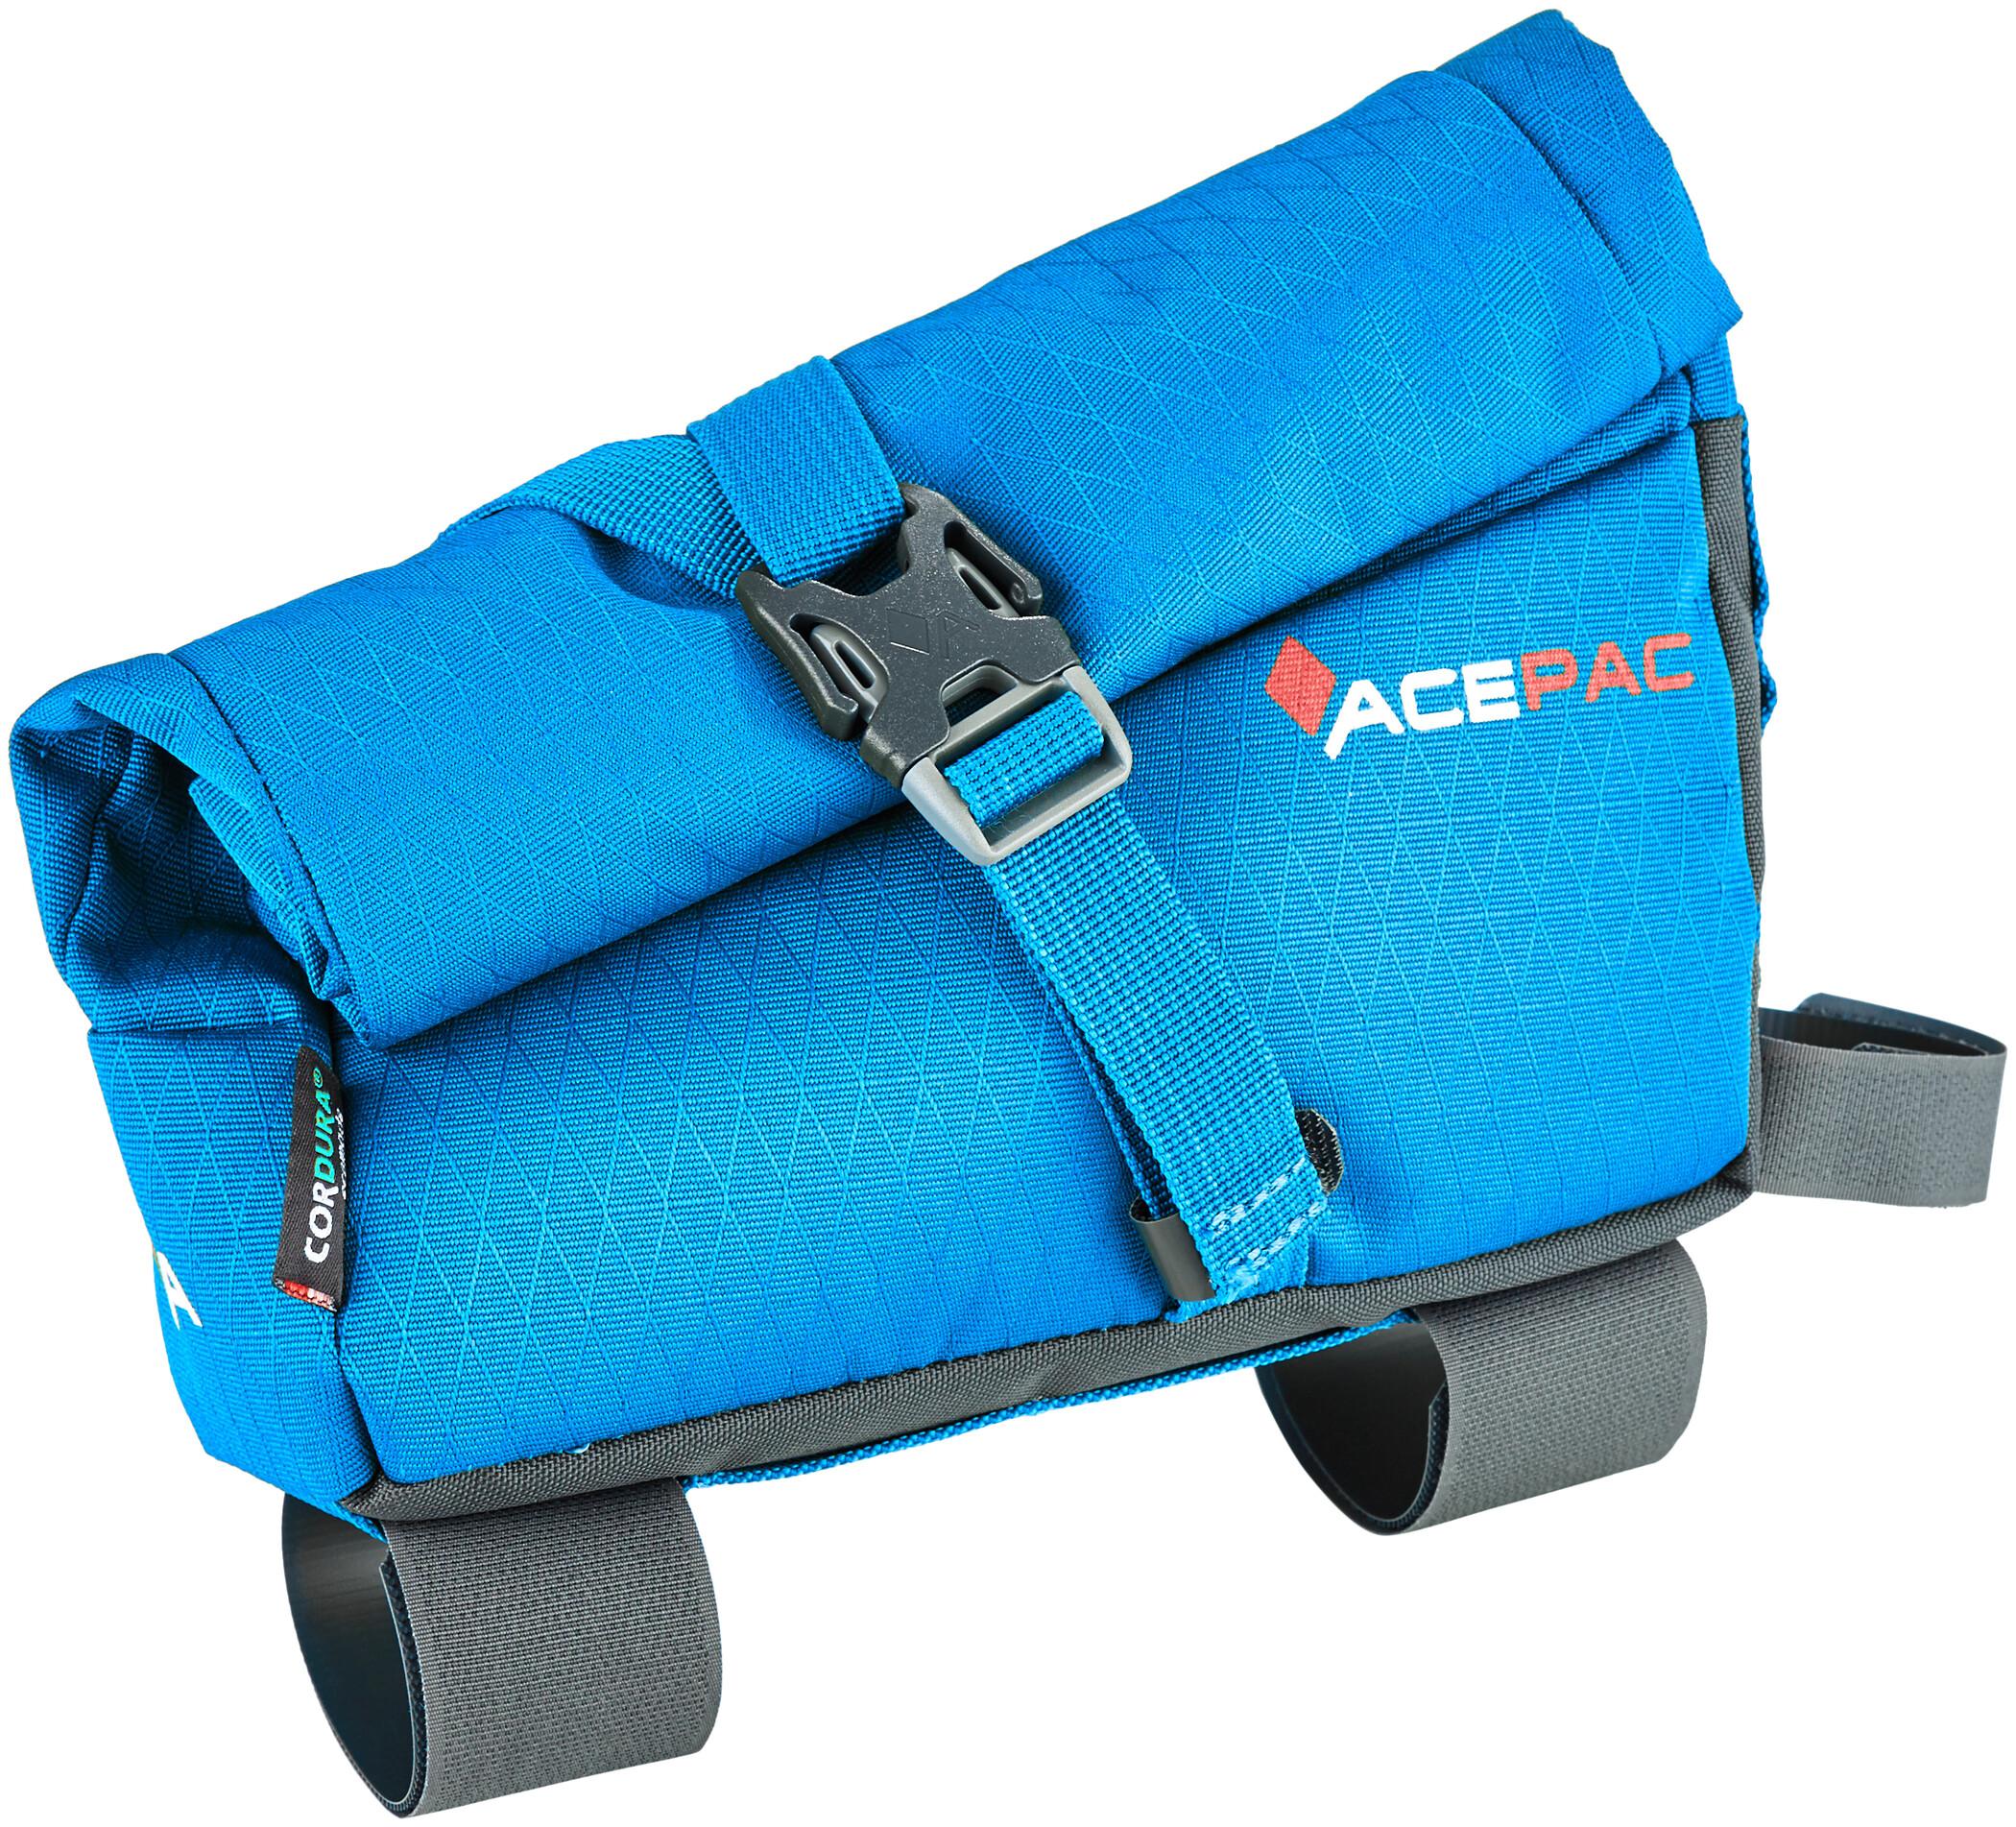 Acepac Roll Fuel Frame Bag, blue (2019)   Frame bags